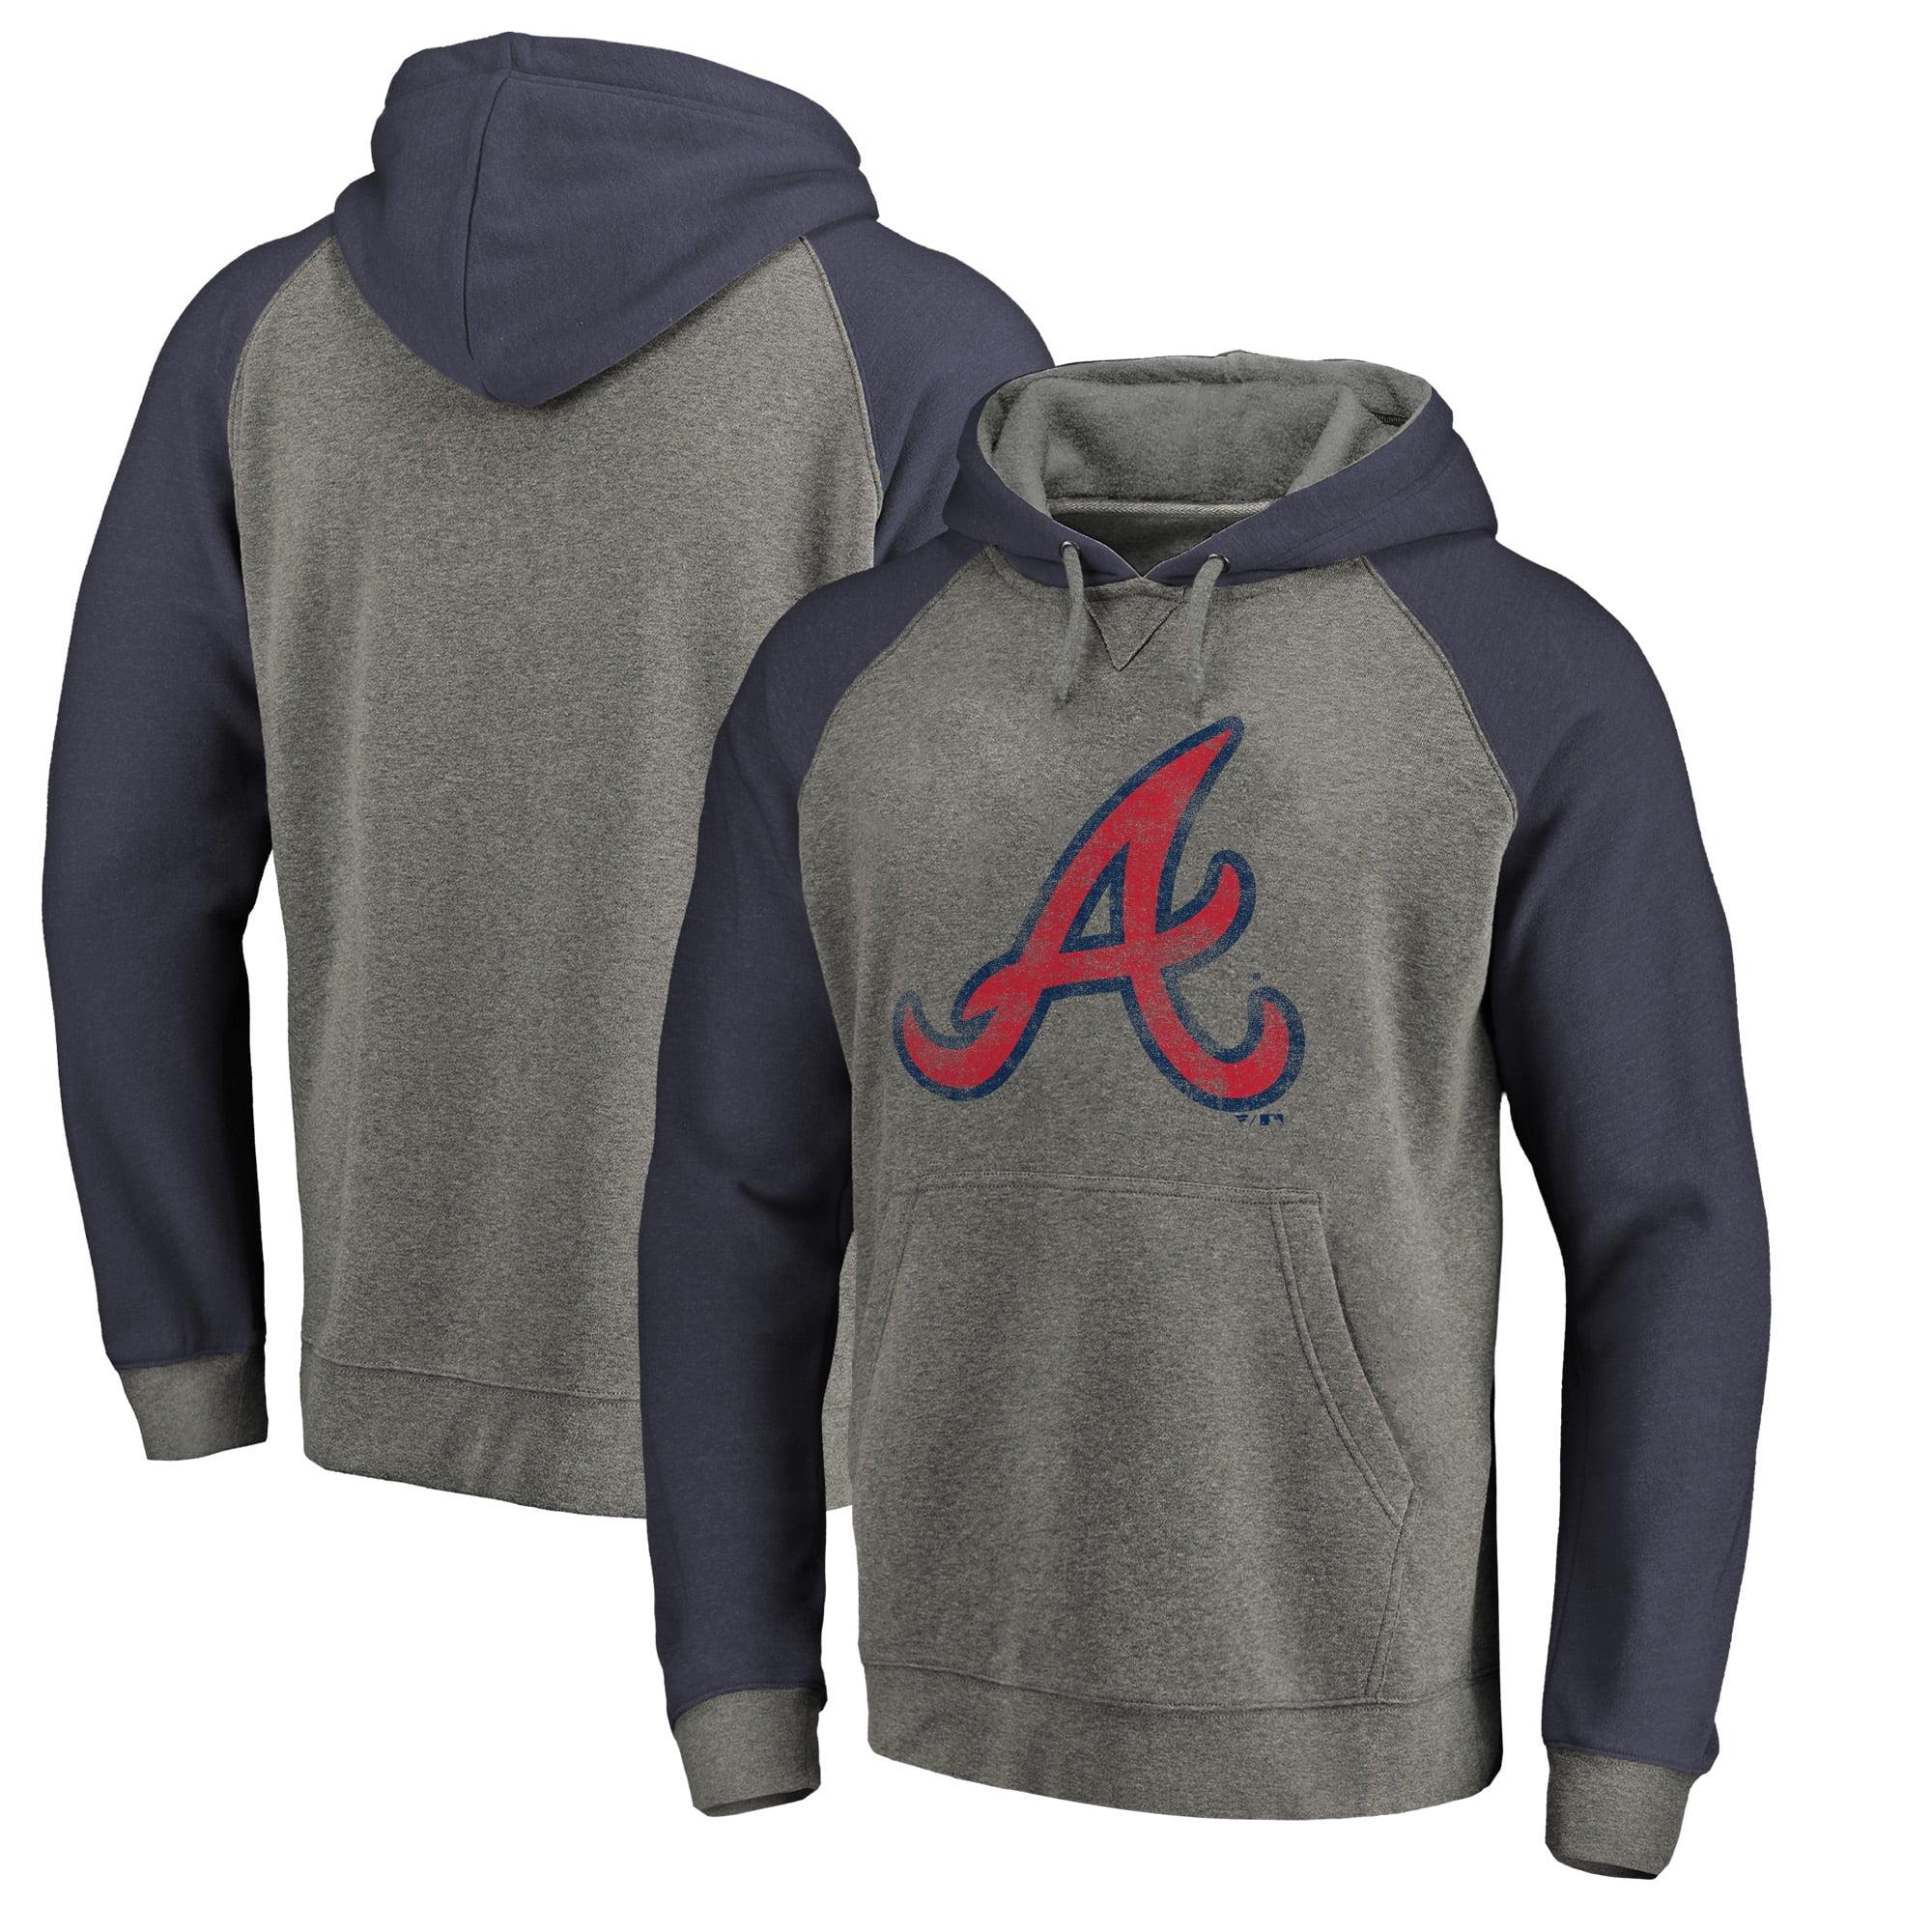 Atlanta Braves Fanatics Branded Distressed Team Logo Tri-Blend Raglan Pullover Hoodie - Gray/Navy